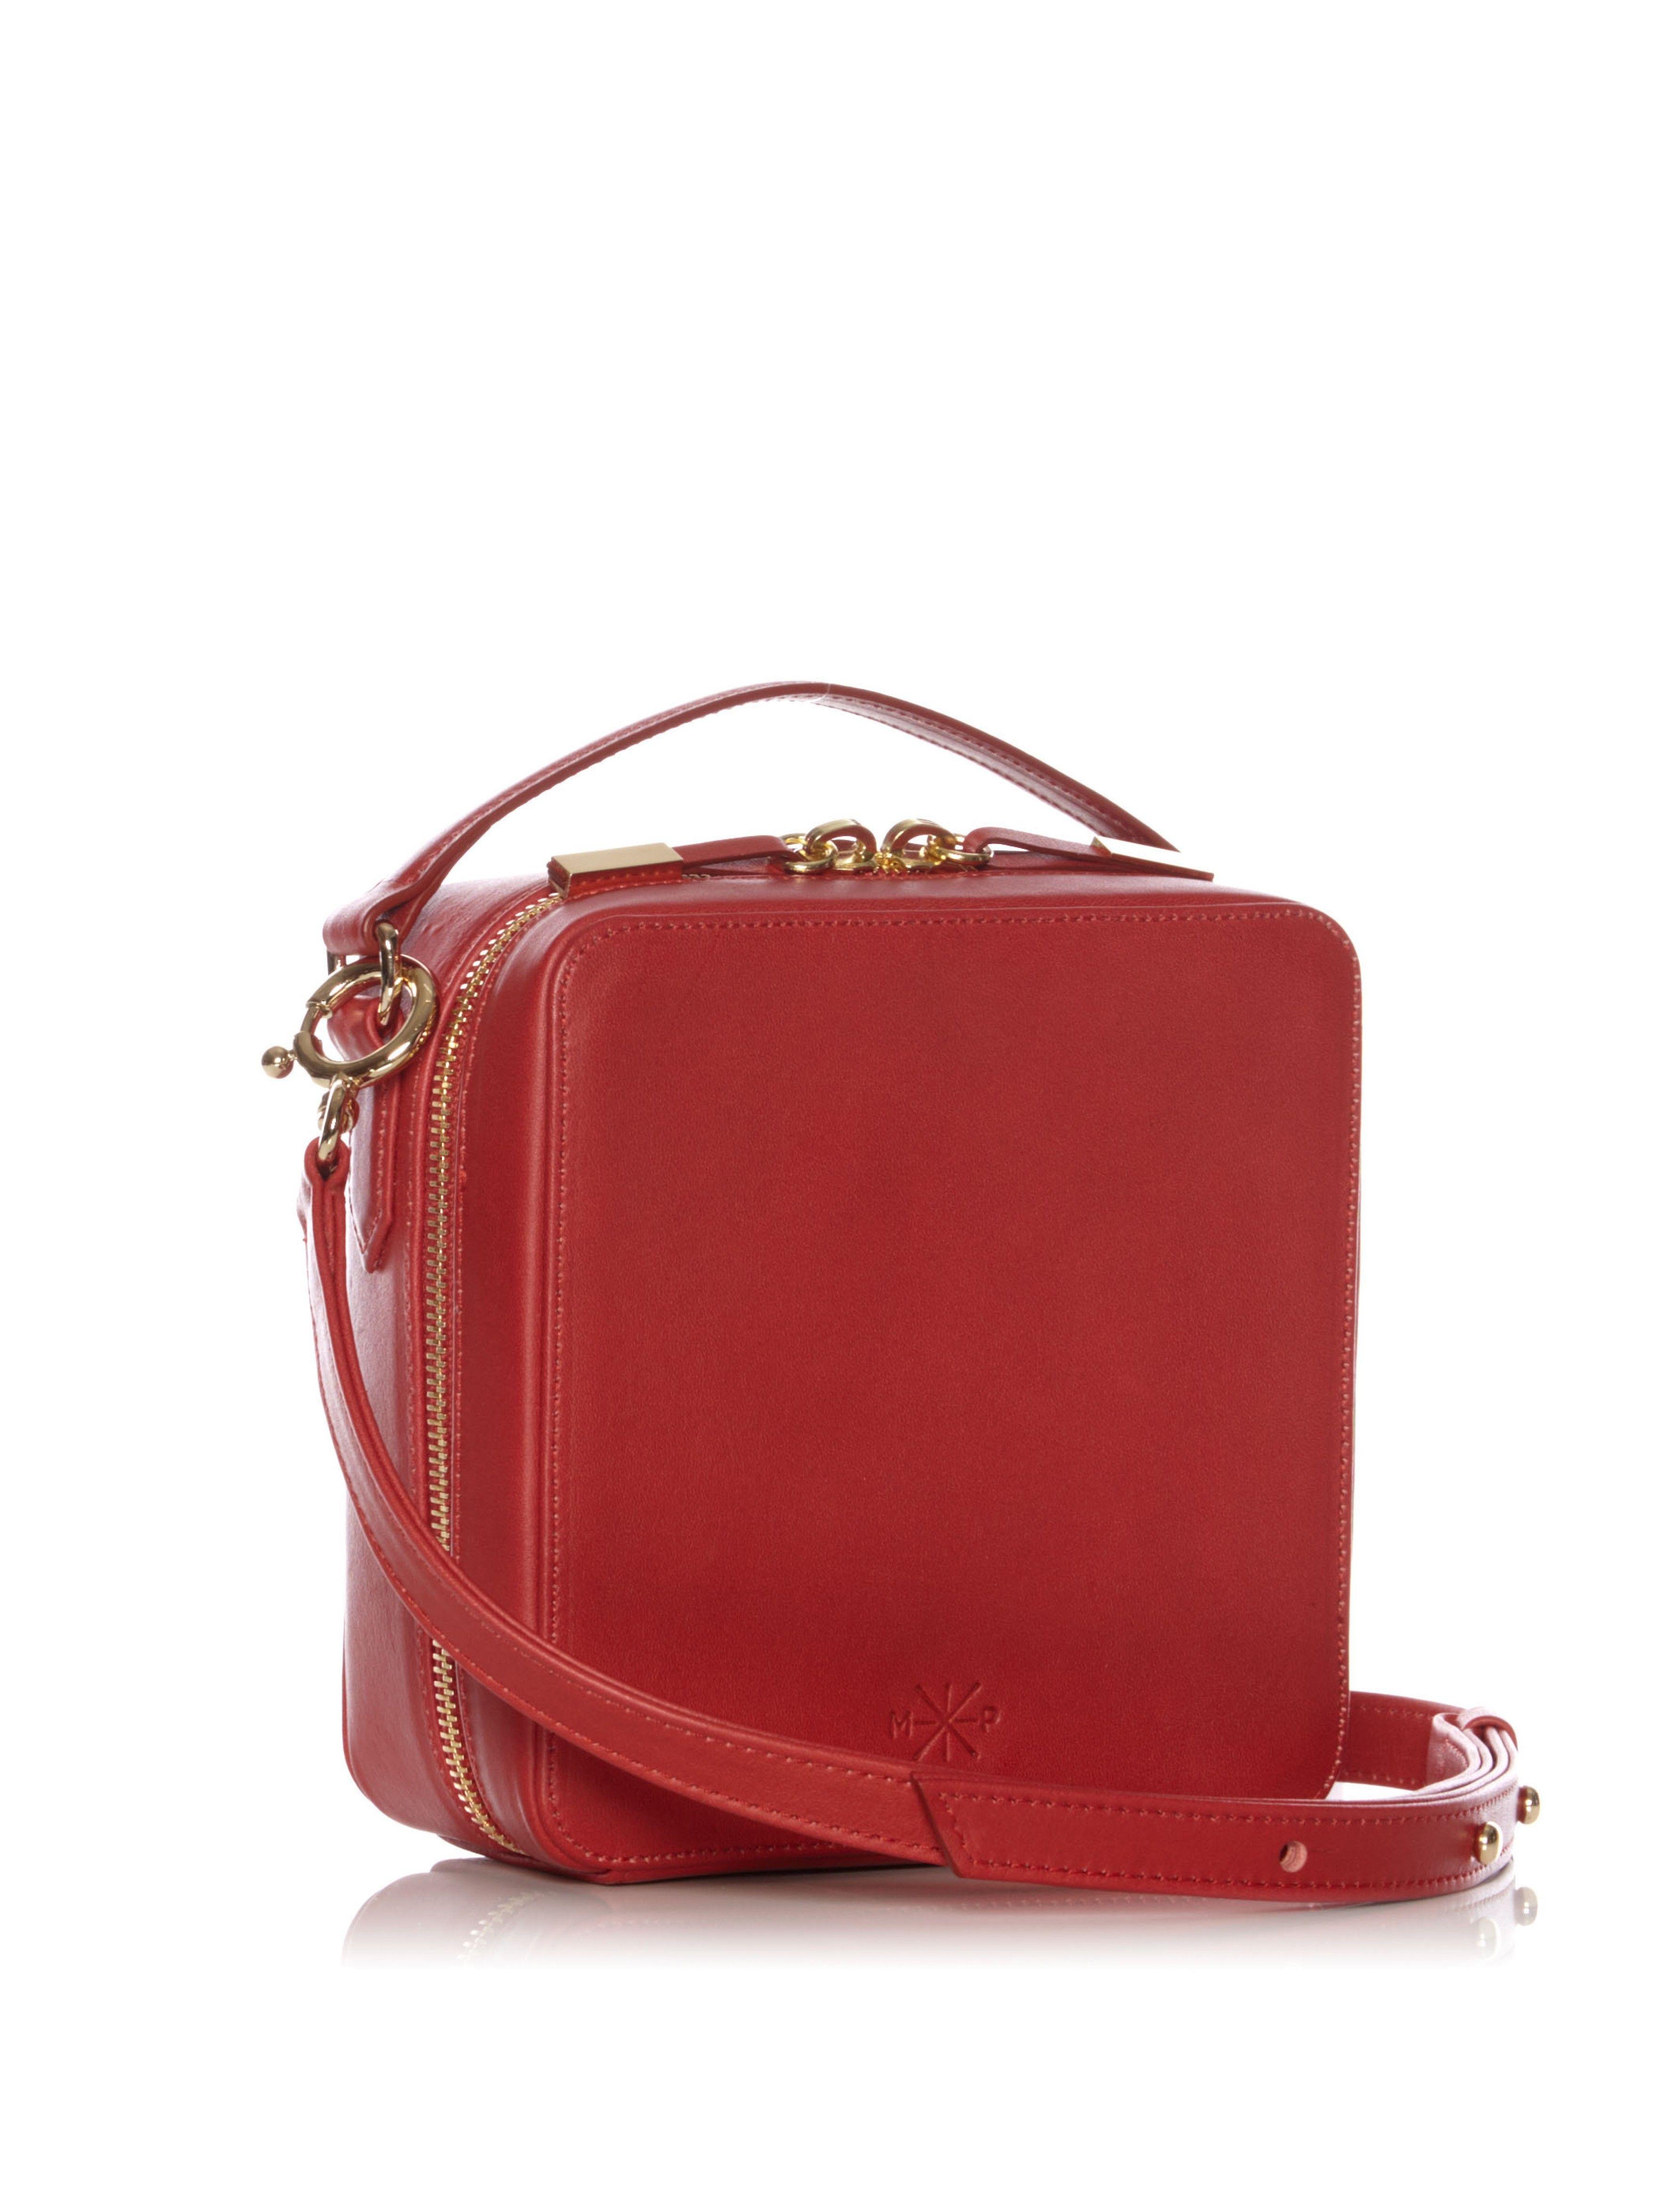 b477558286 Manufacture Pascal Shoulder Bags Lady Box Mini Crossbody